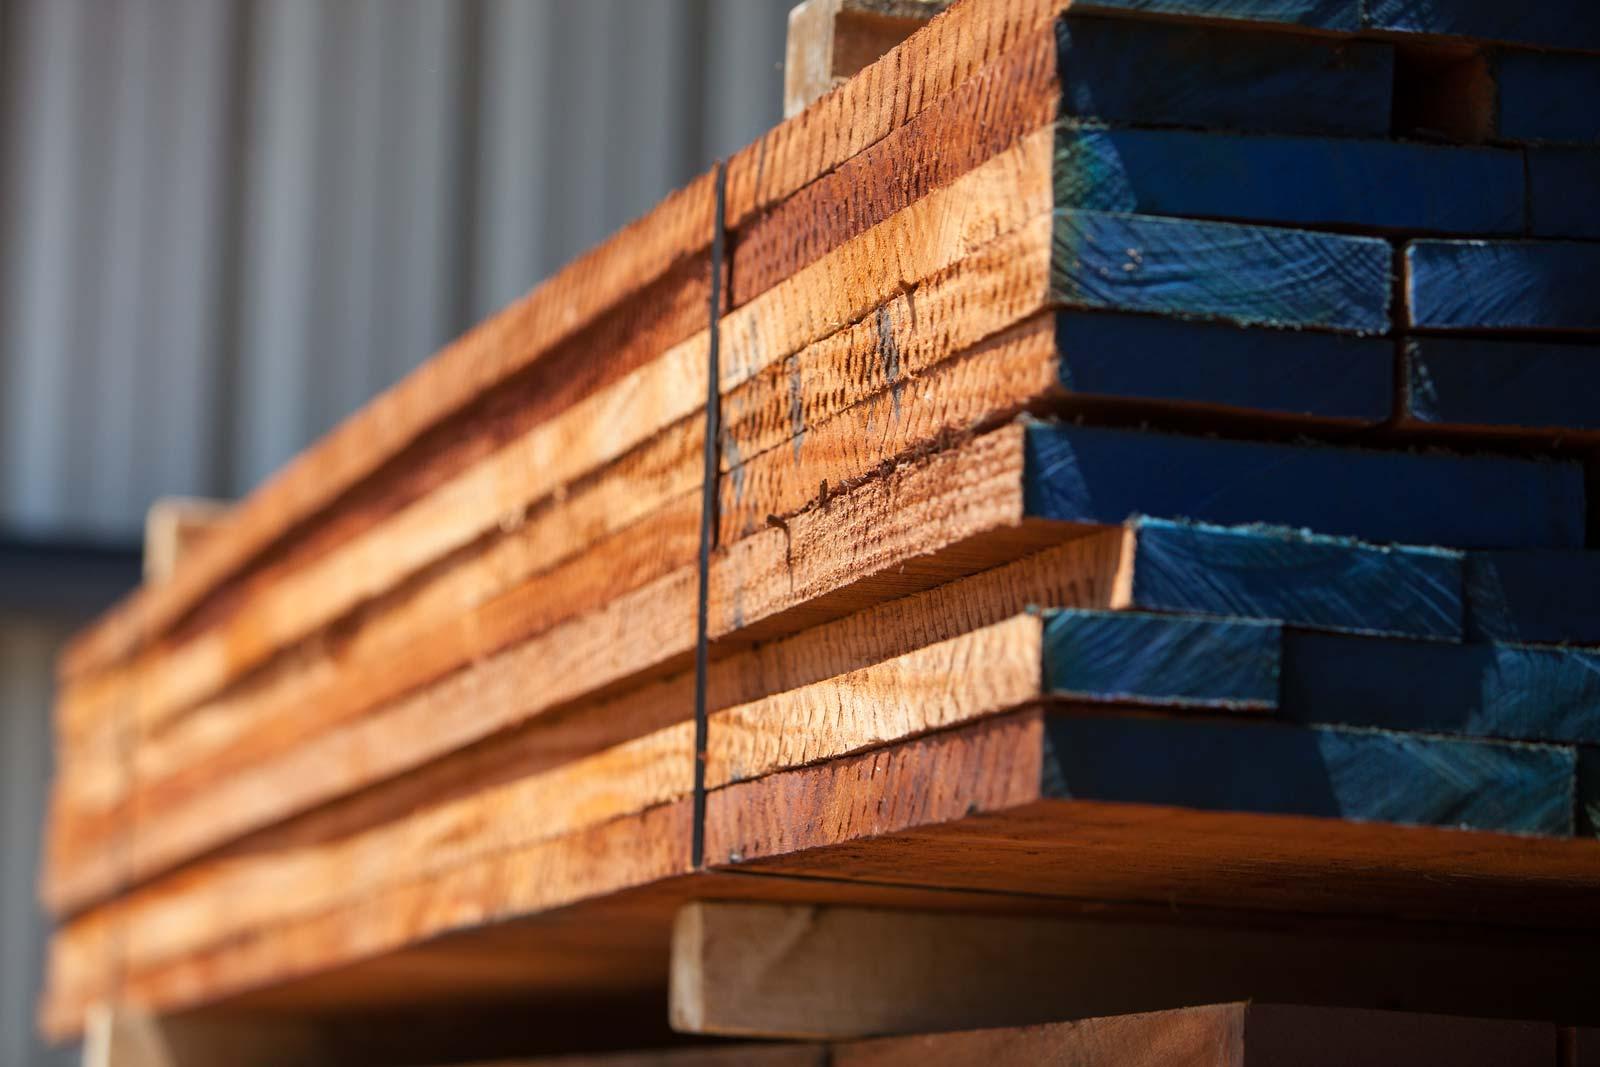 Strong, heavy pile of Ferche raw lumber